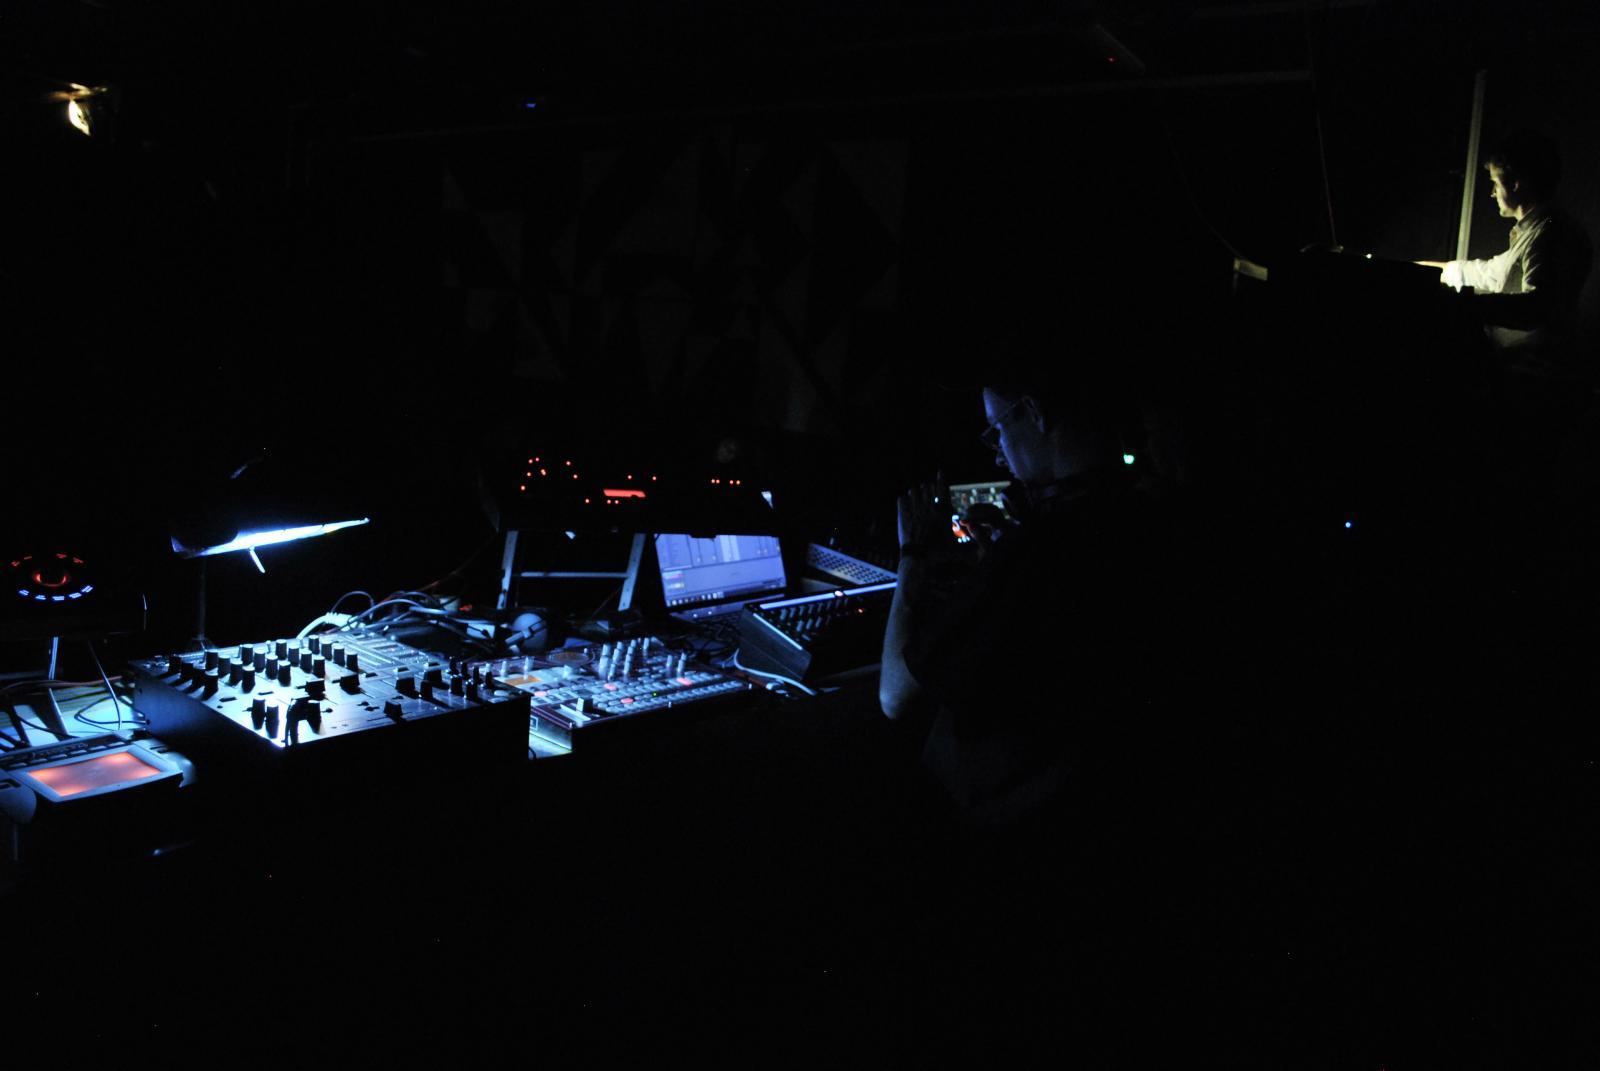 LPM'14 with V/TLD (Masecki/Rogiewicz/DJ Lenar) / PIOTR BEJNAR / LARIX / INTERFUSION / ELEKTROMOON VISION